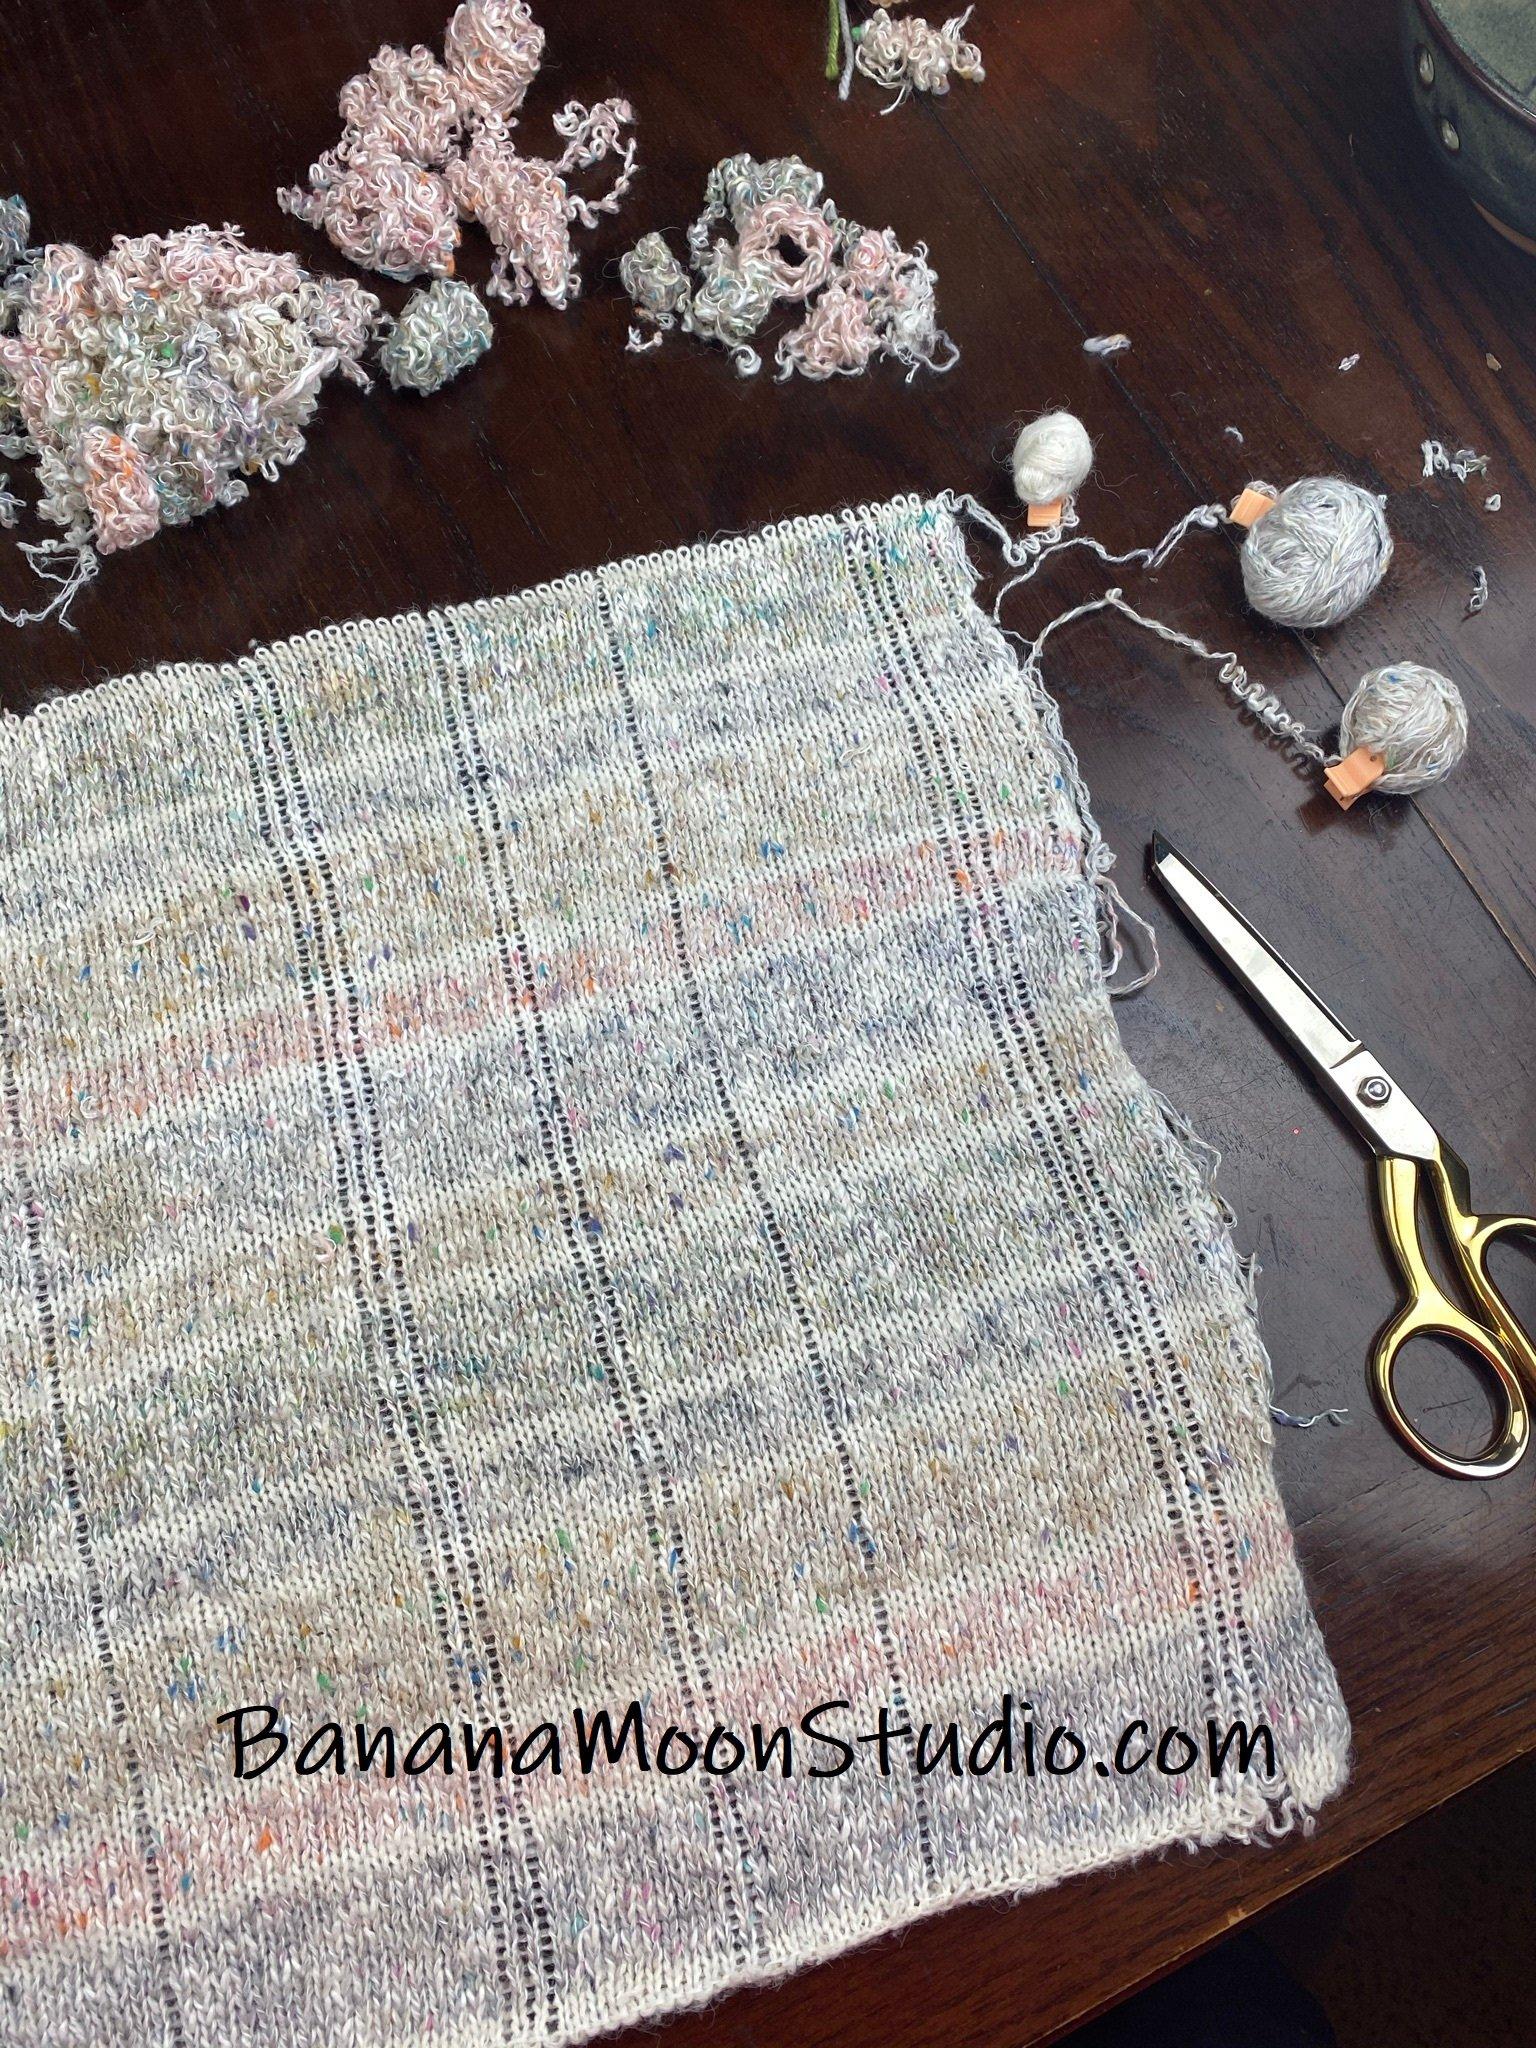 Taking apart a sweater for yarn, photo tutorial from Banana Moon Studio